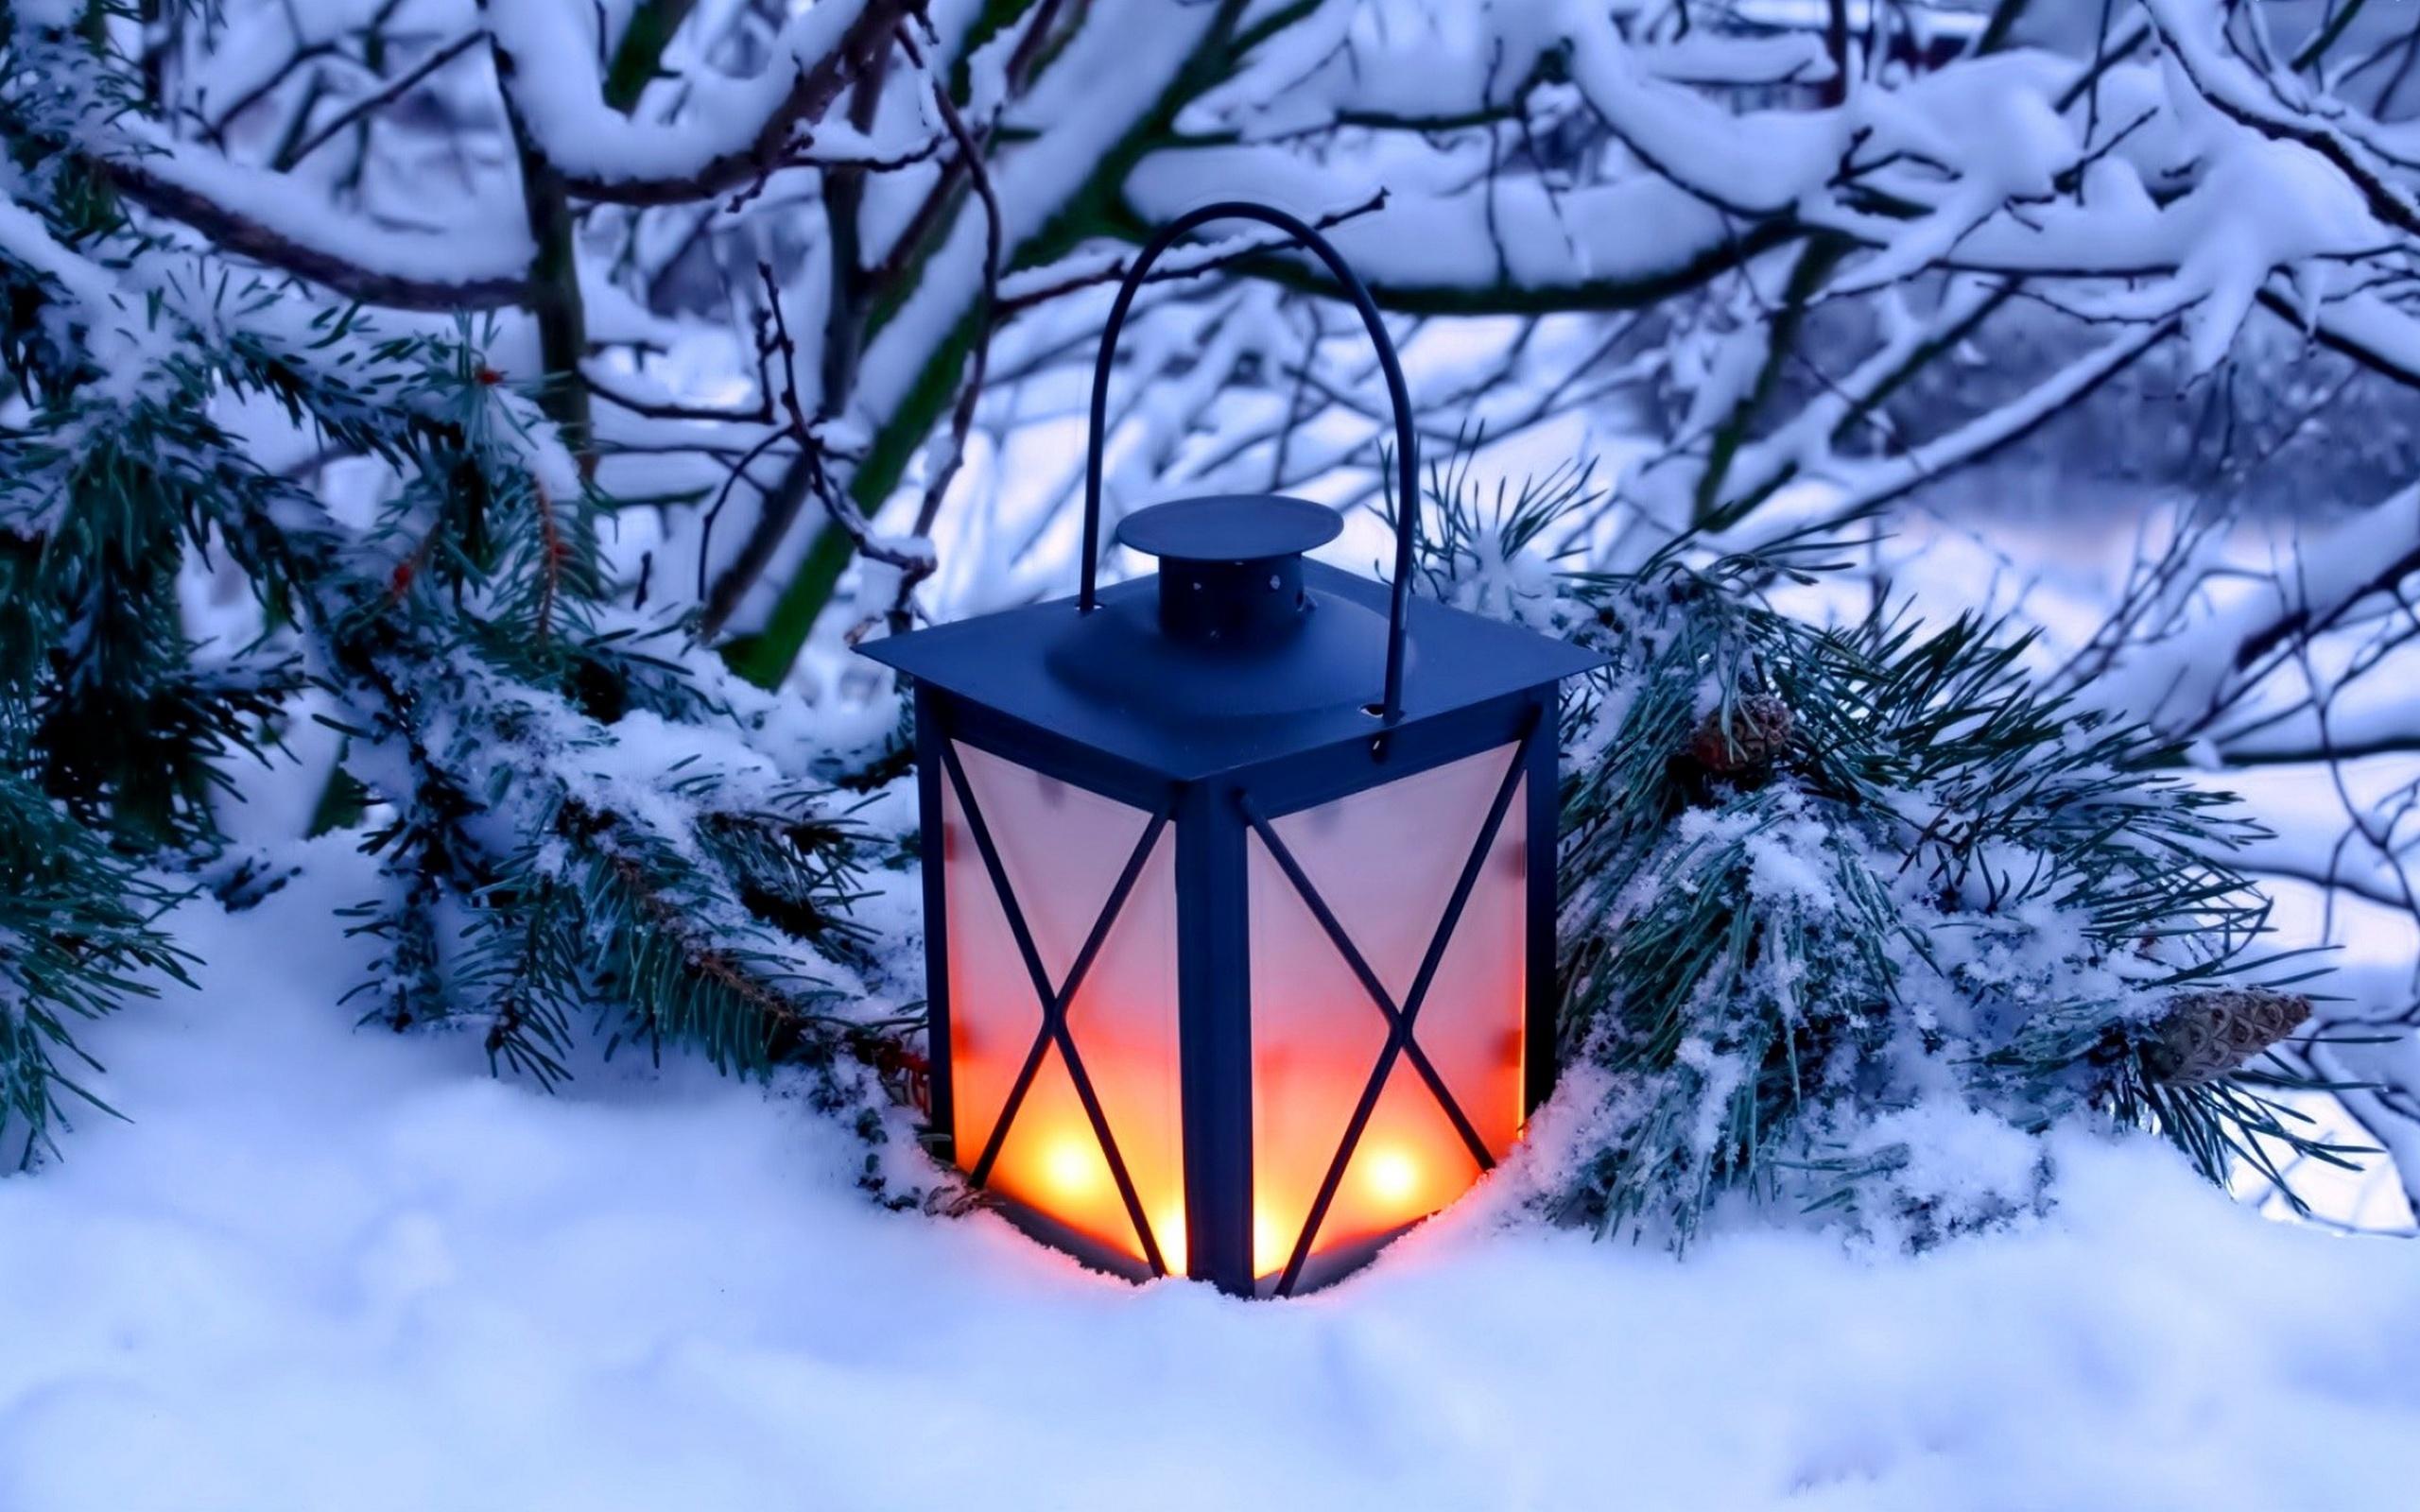 благоустроена, снег на фонарях картинки момент